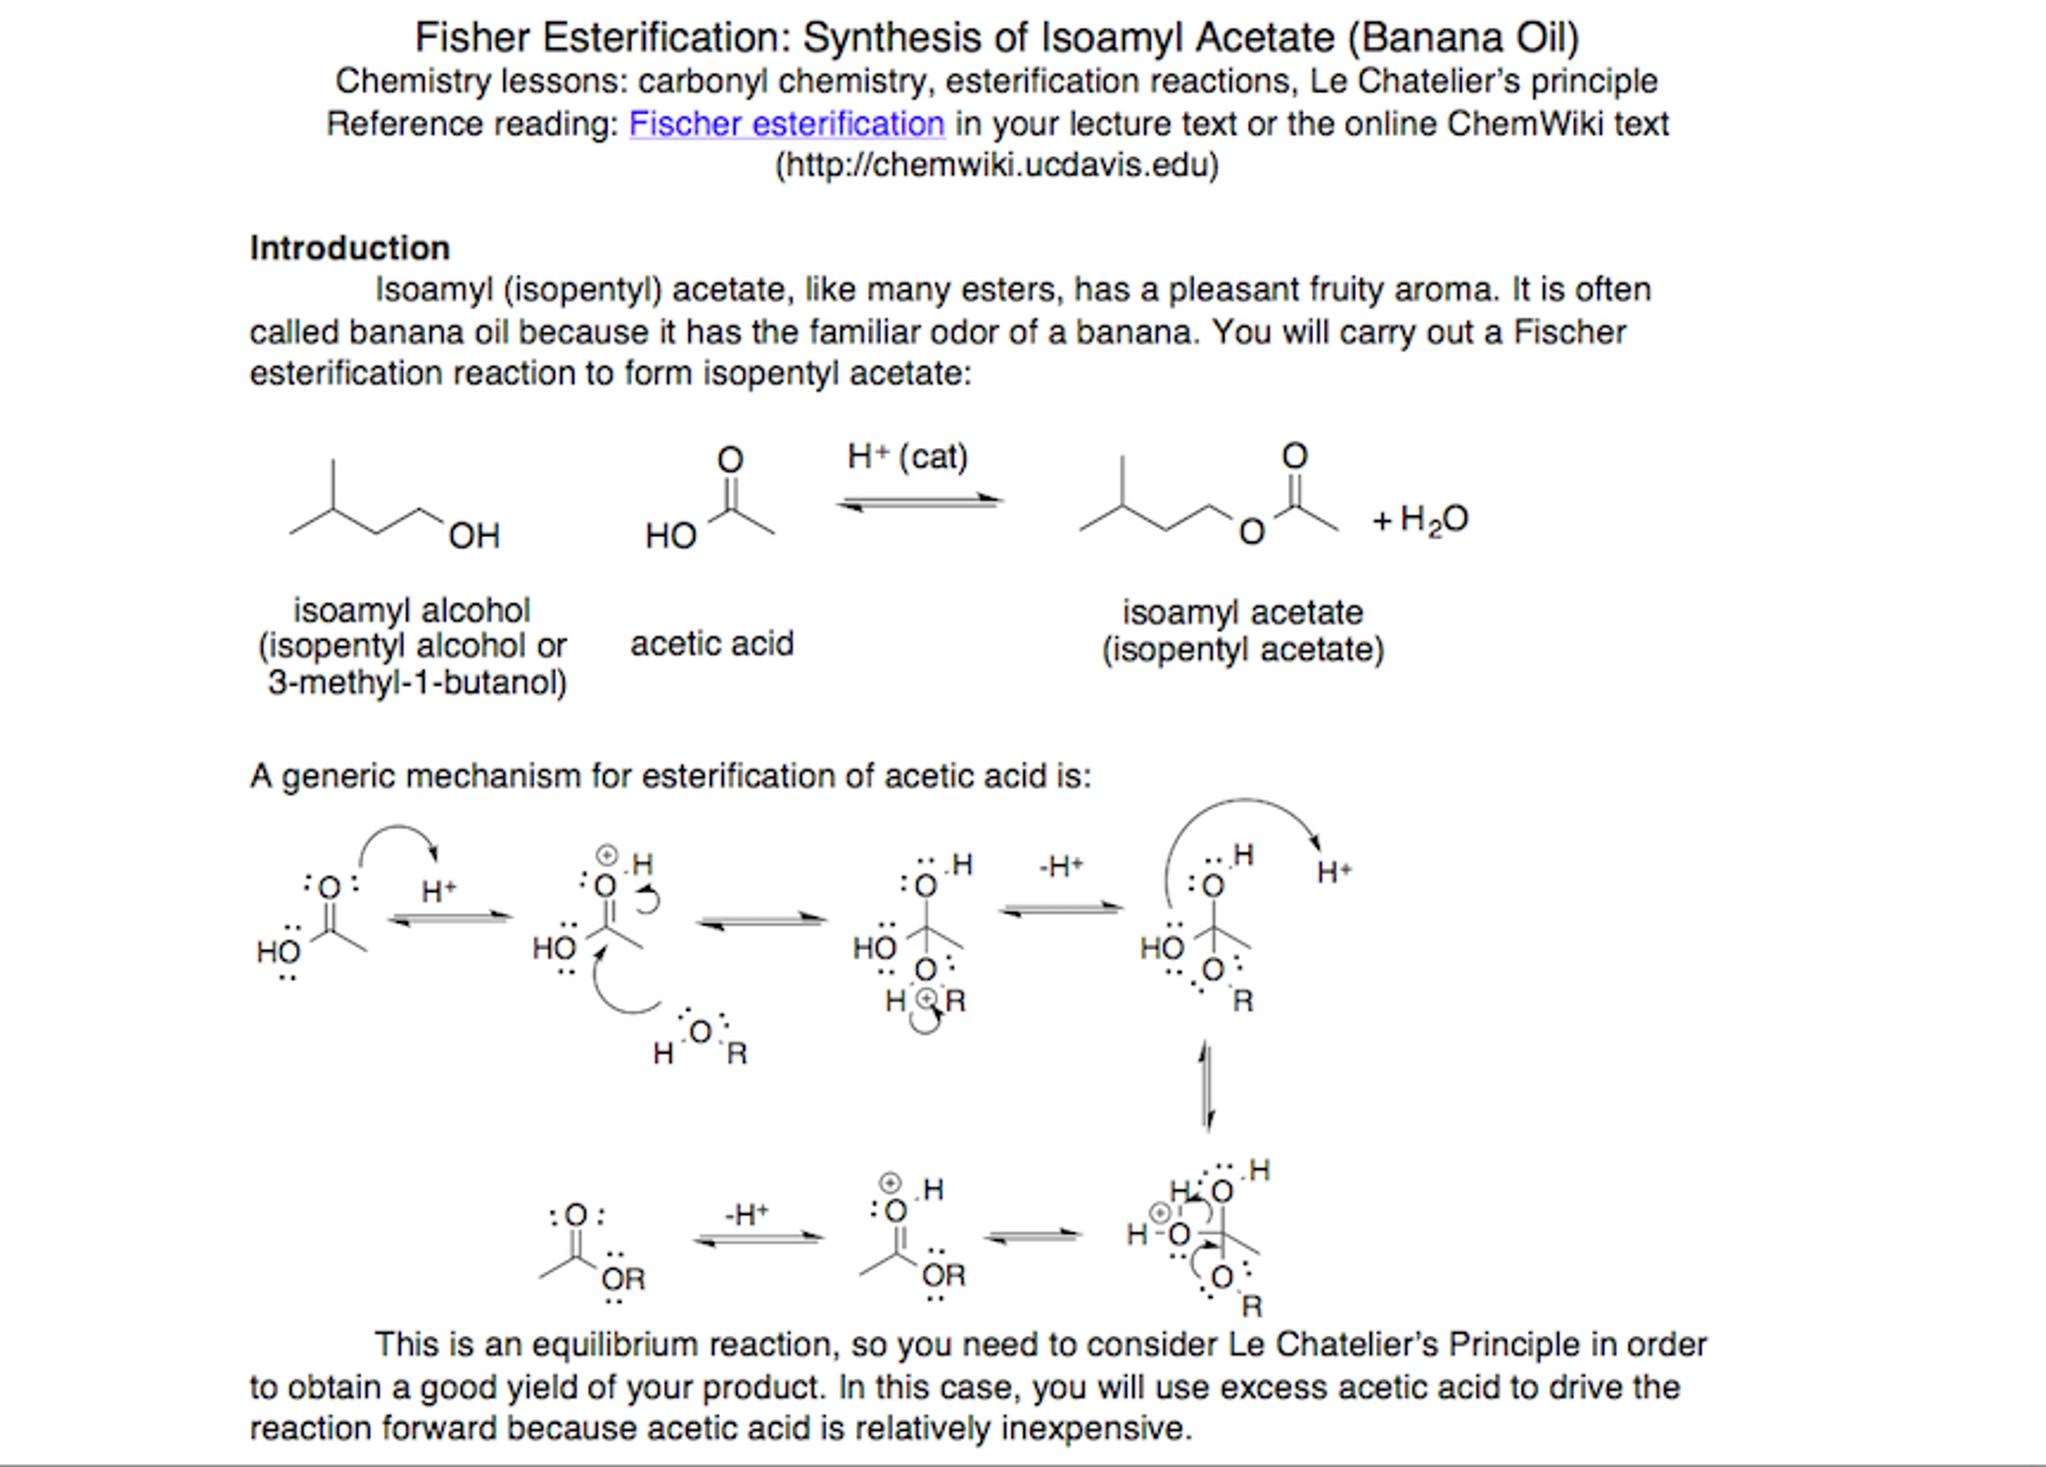 esterification of acetic acid with isopentyl alcohol